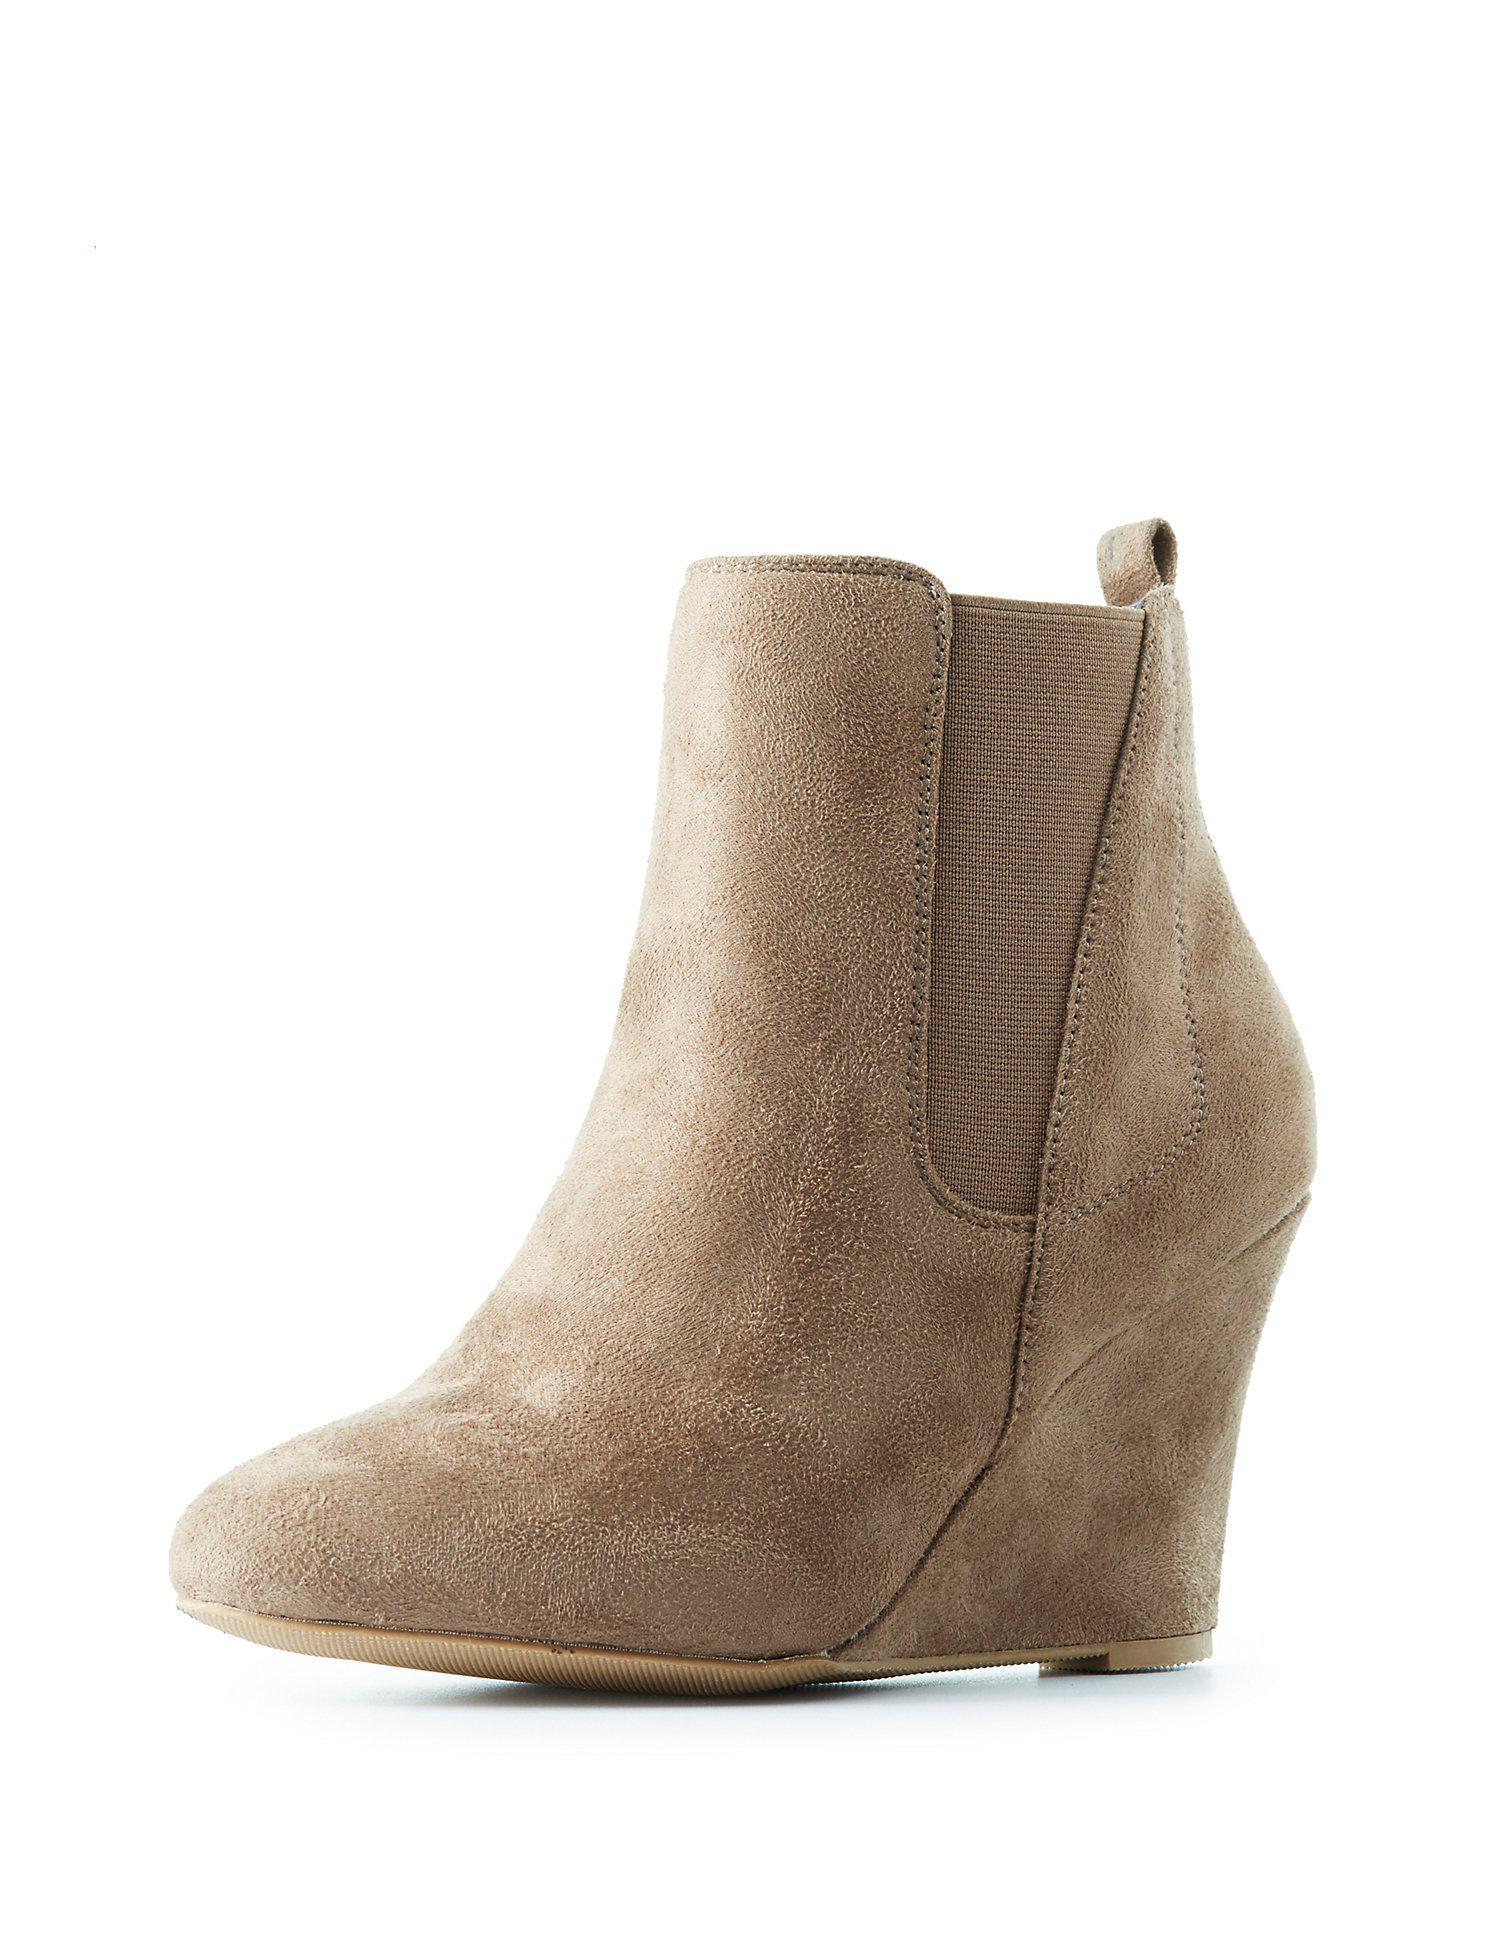 0b3c0b8b72fd Lyst - Charlotte Russe Side Gore Wedge Ankle Booties in Brown